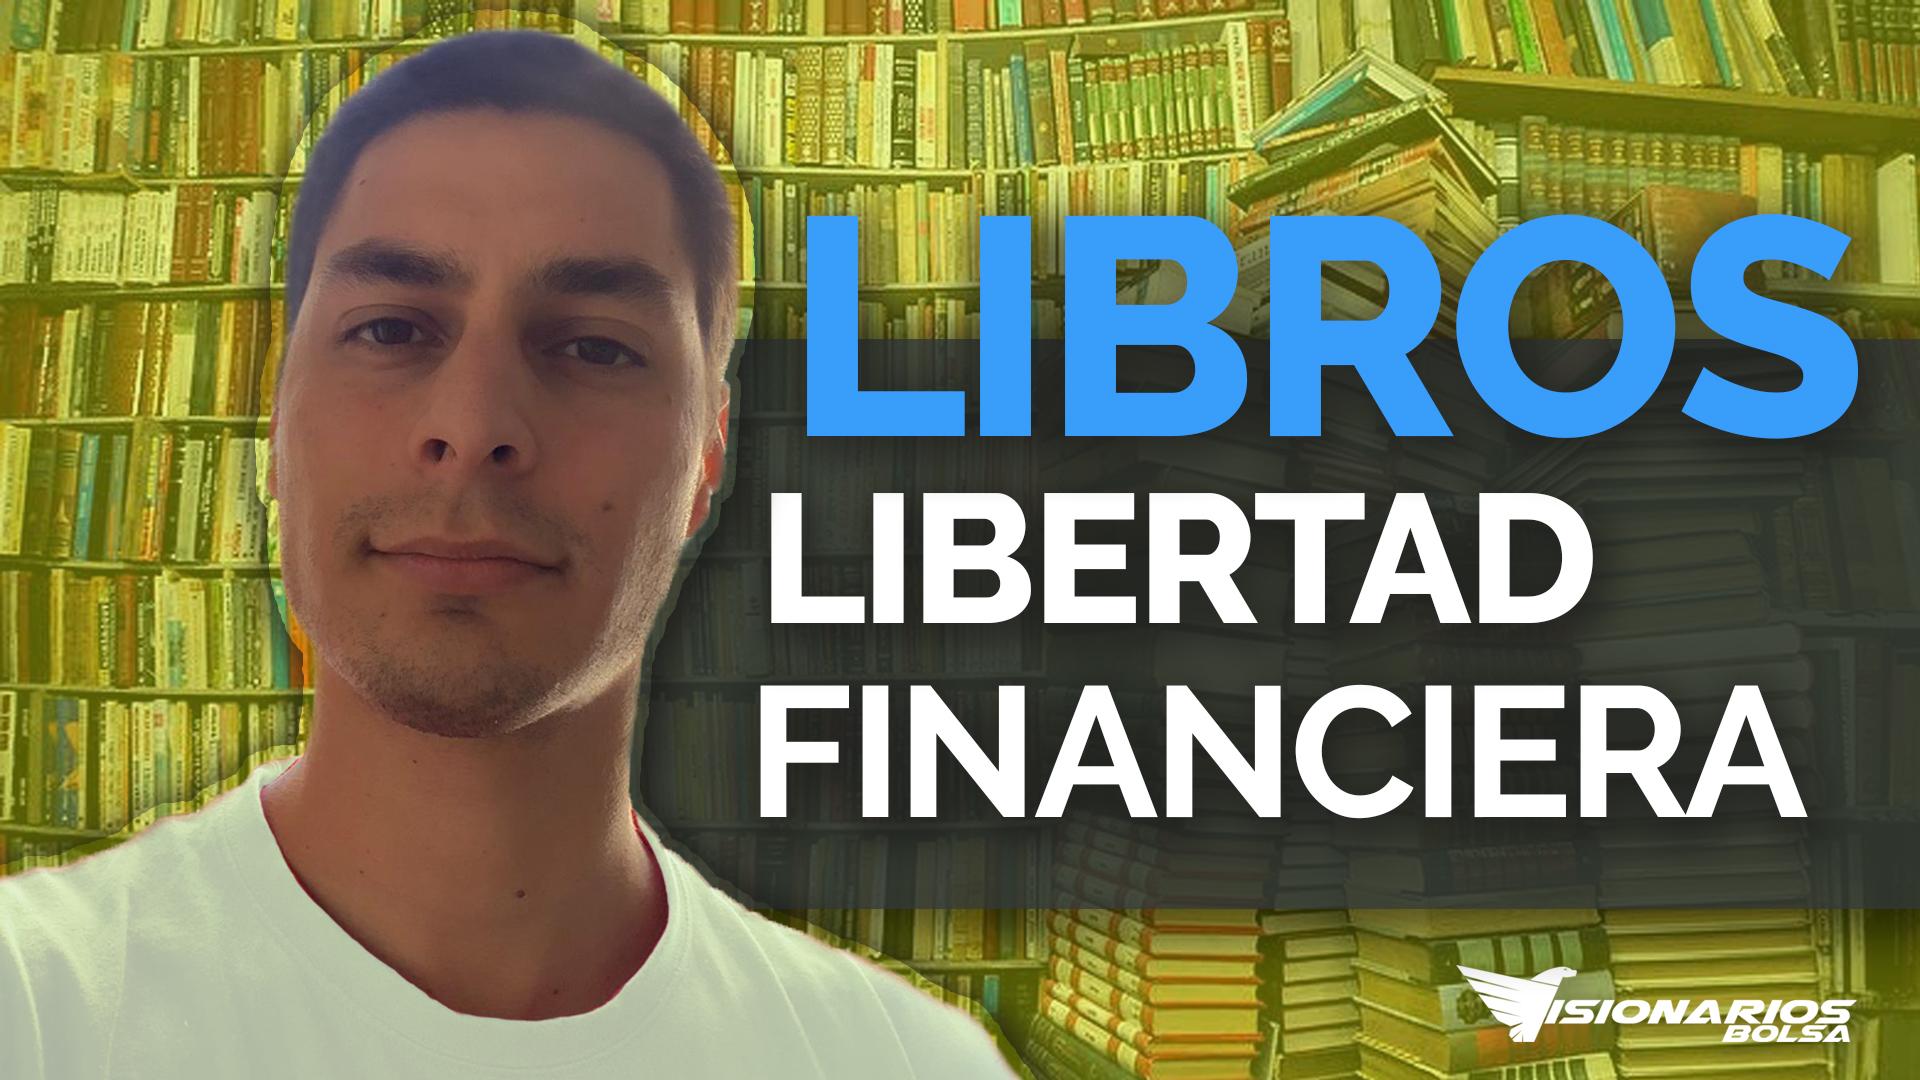 Mejores Libros Sobre Libertad Financiera